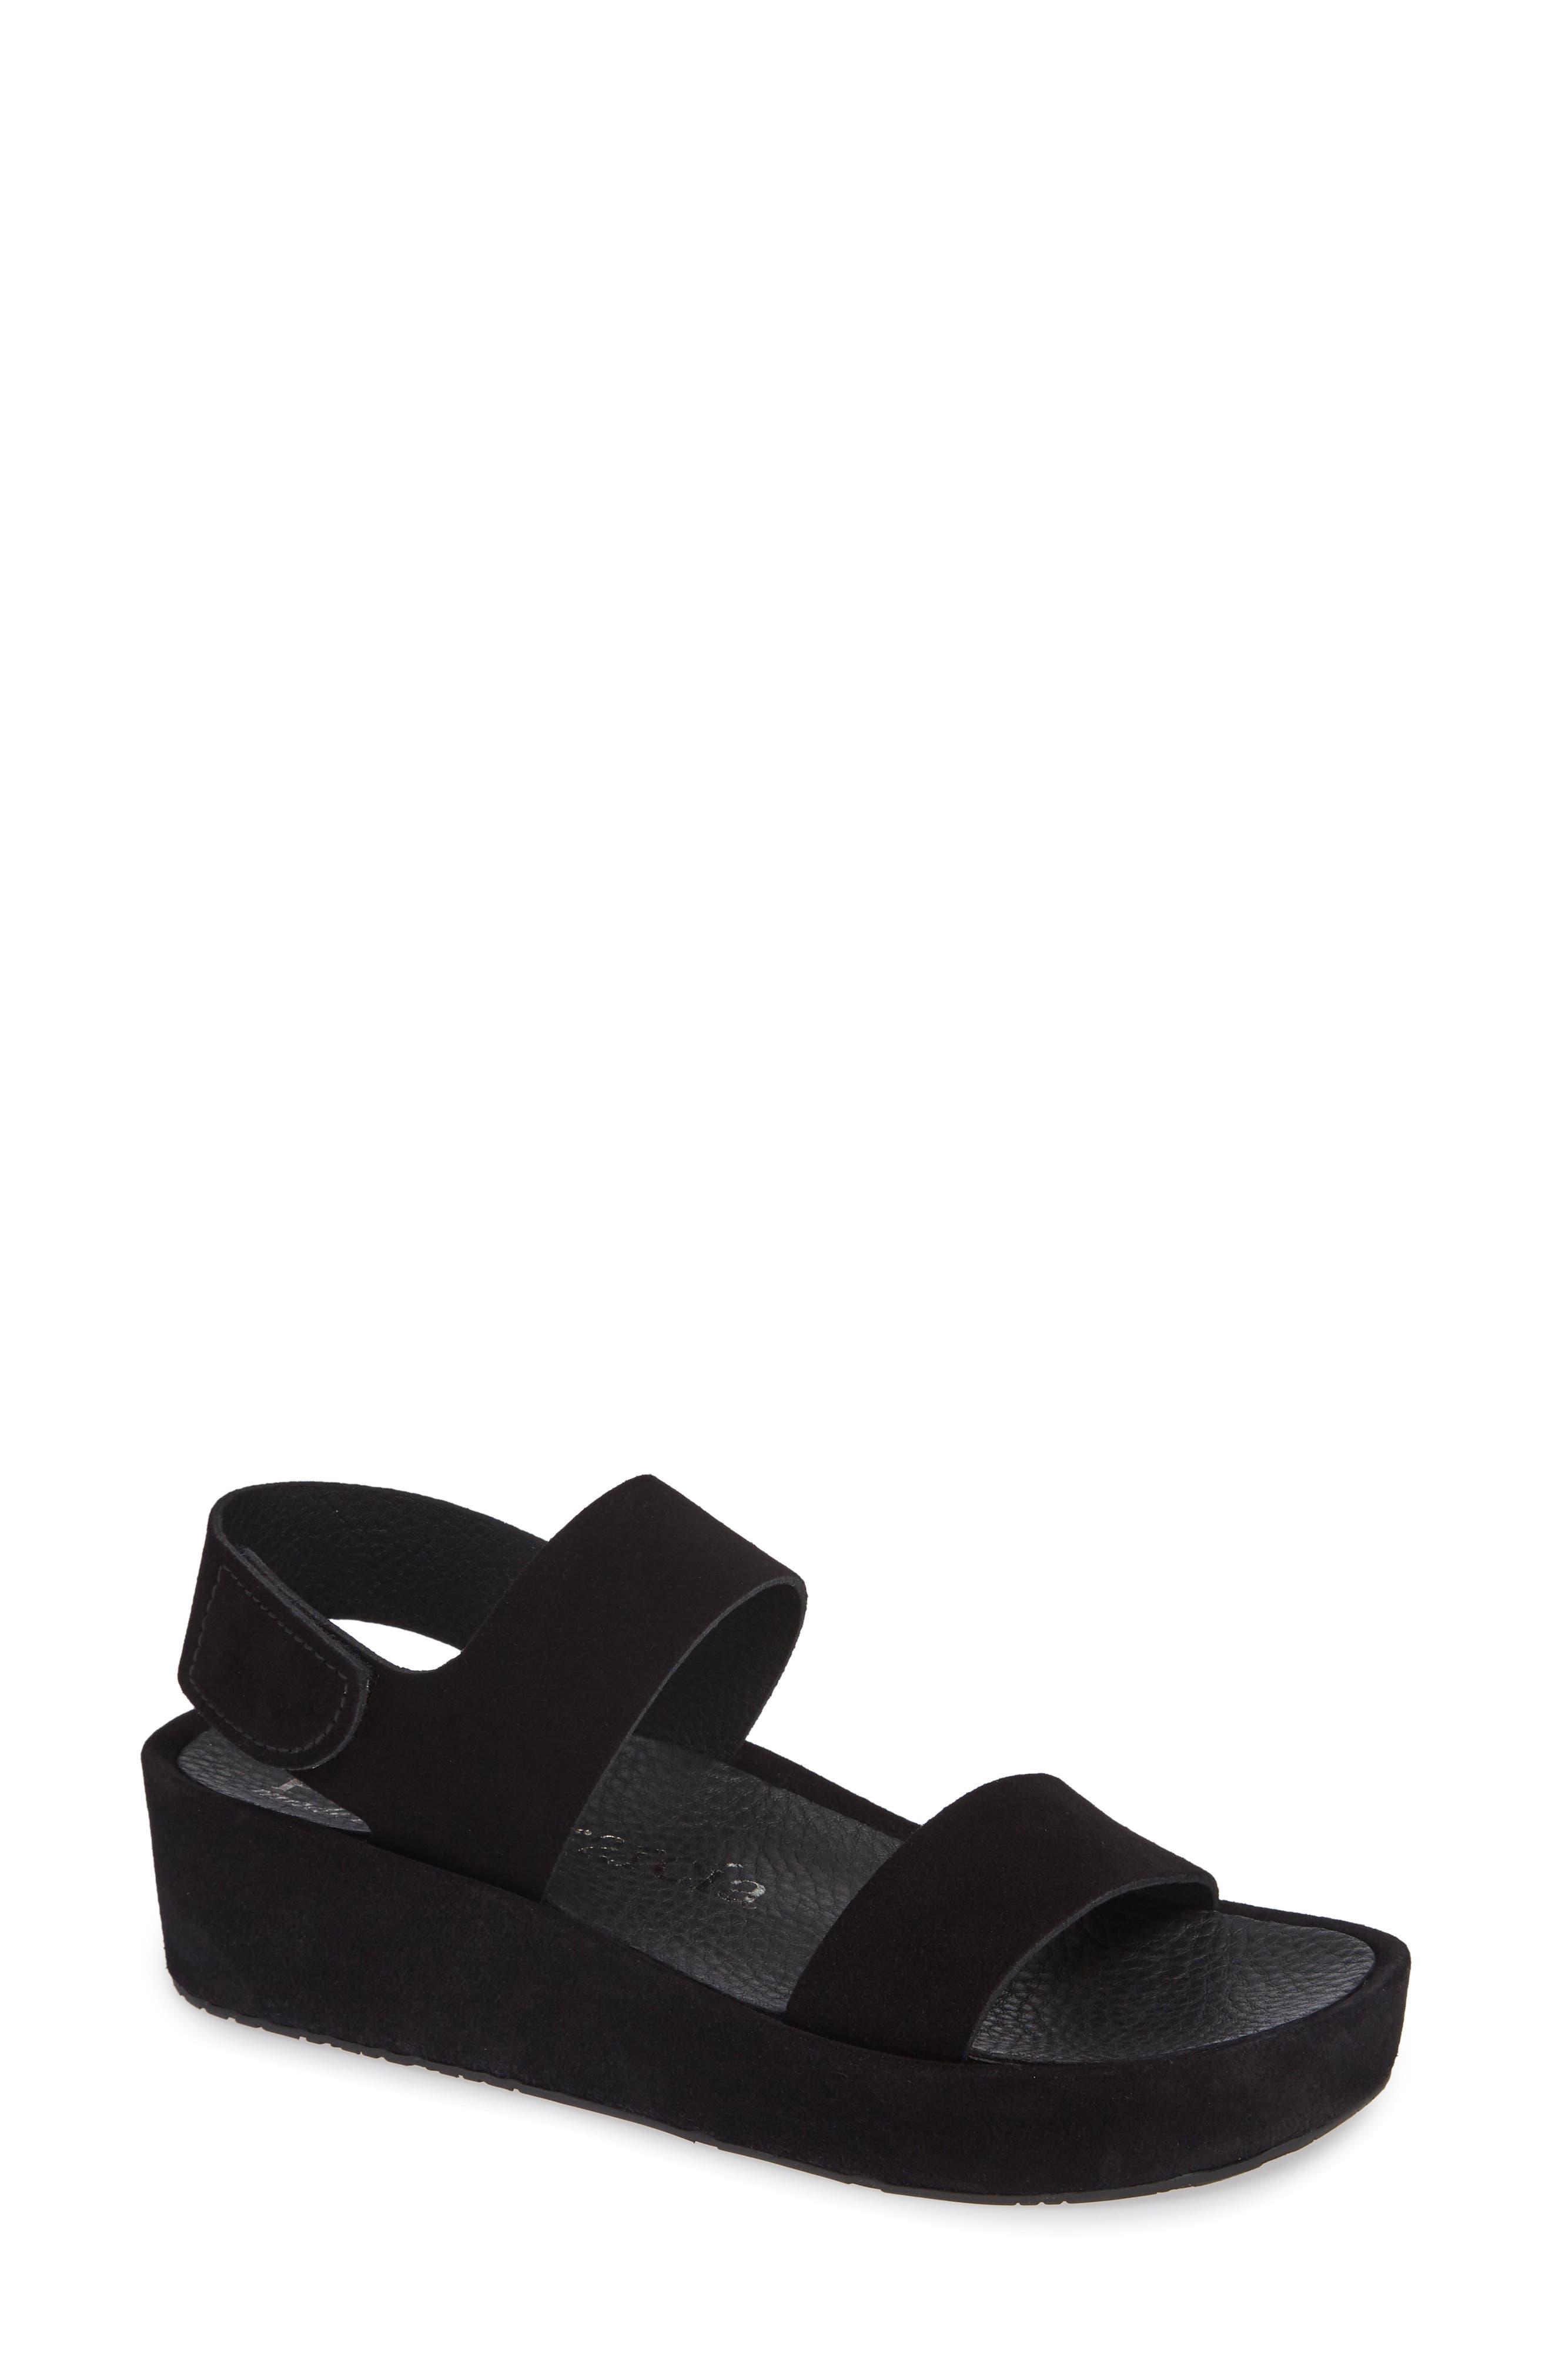 Pedro Garcia Lacey Footbed Sandal, Black